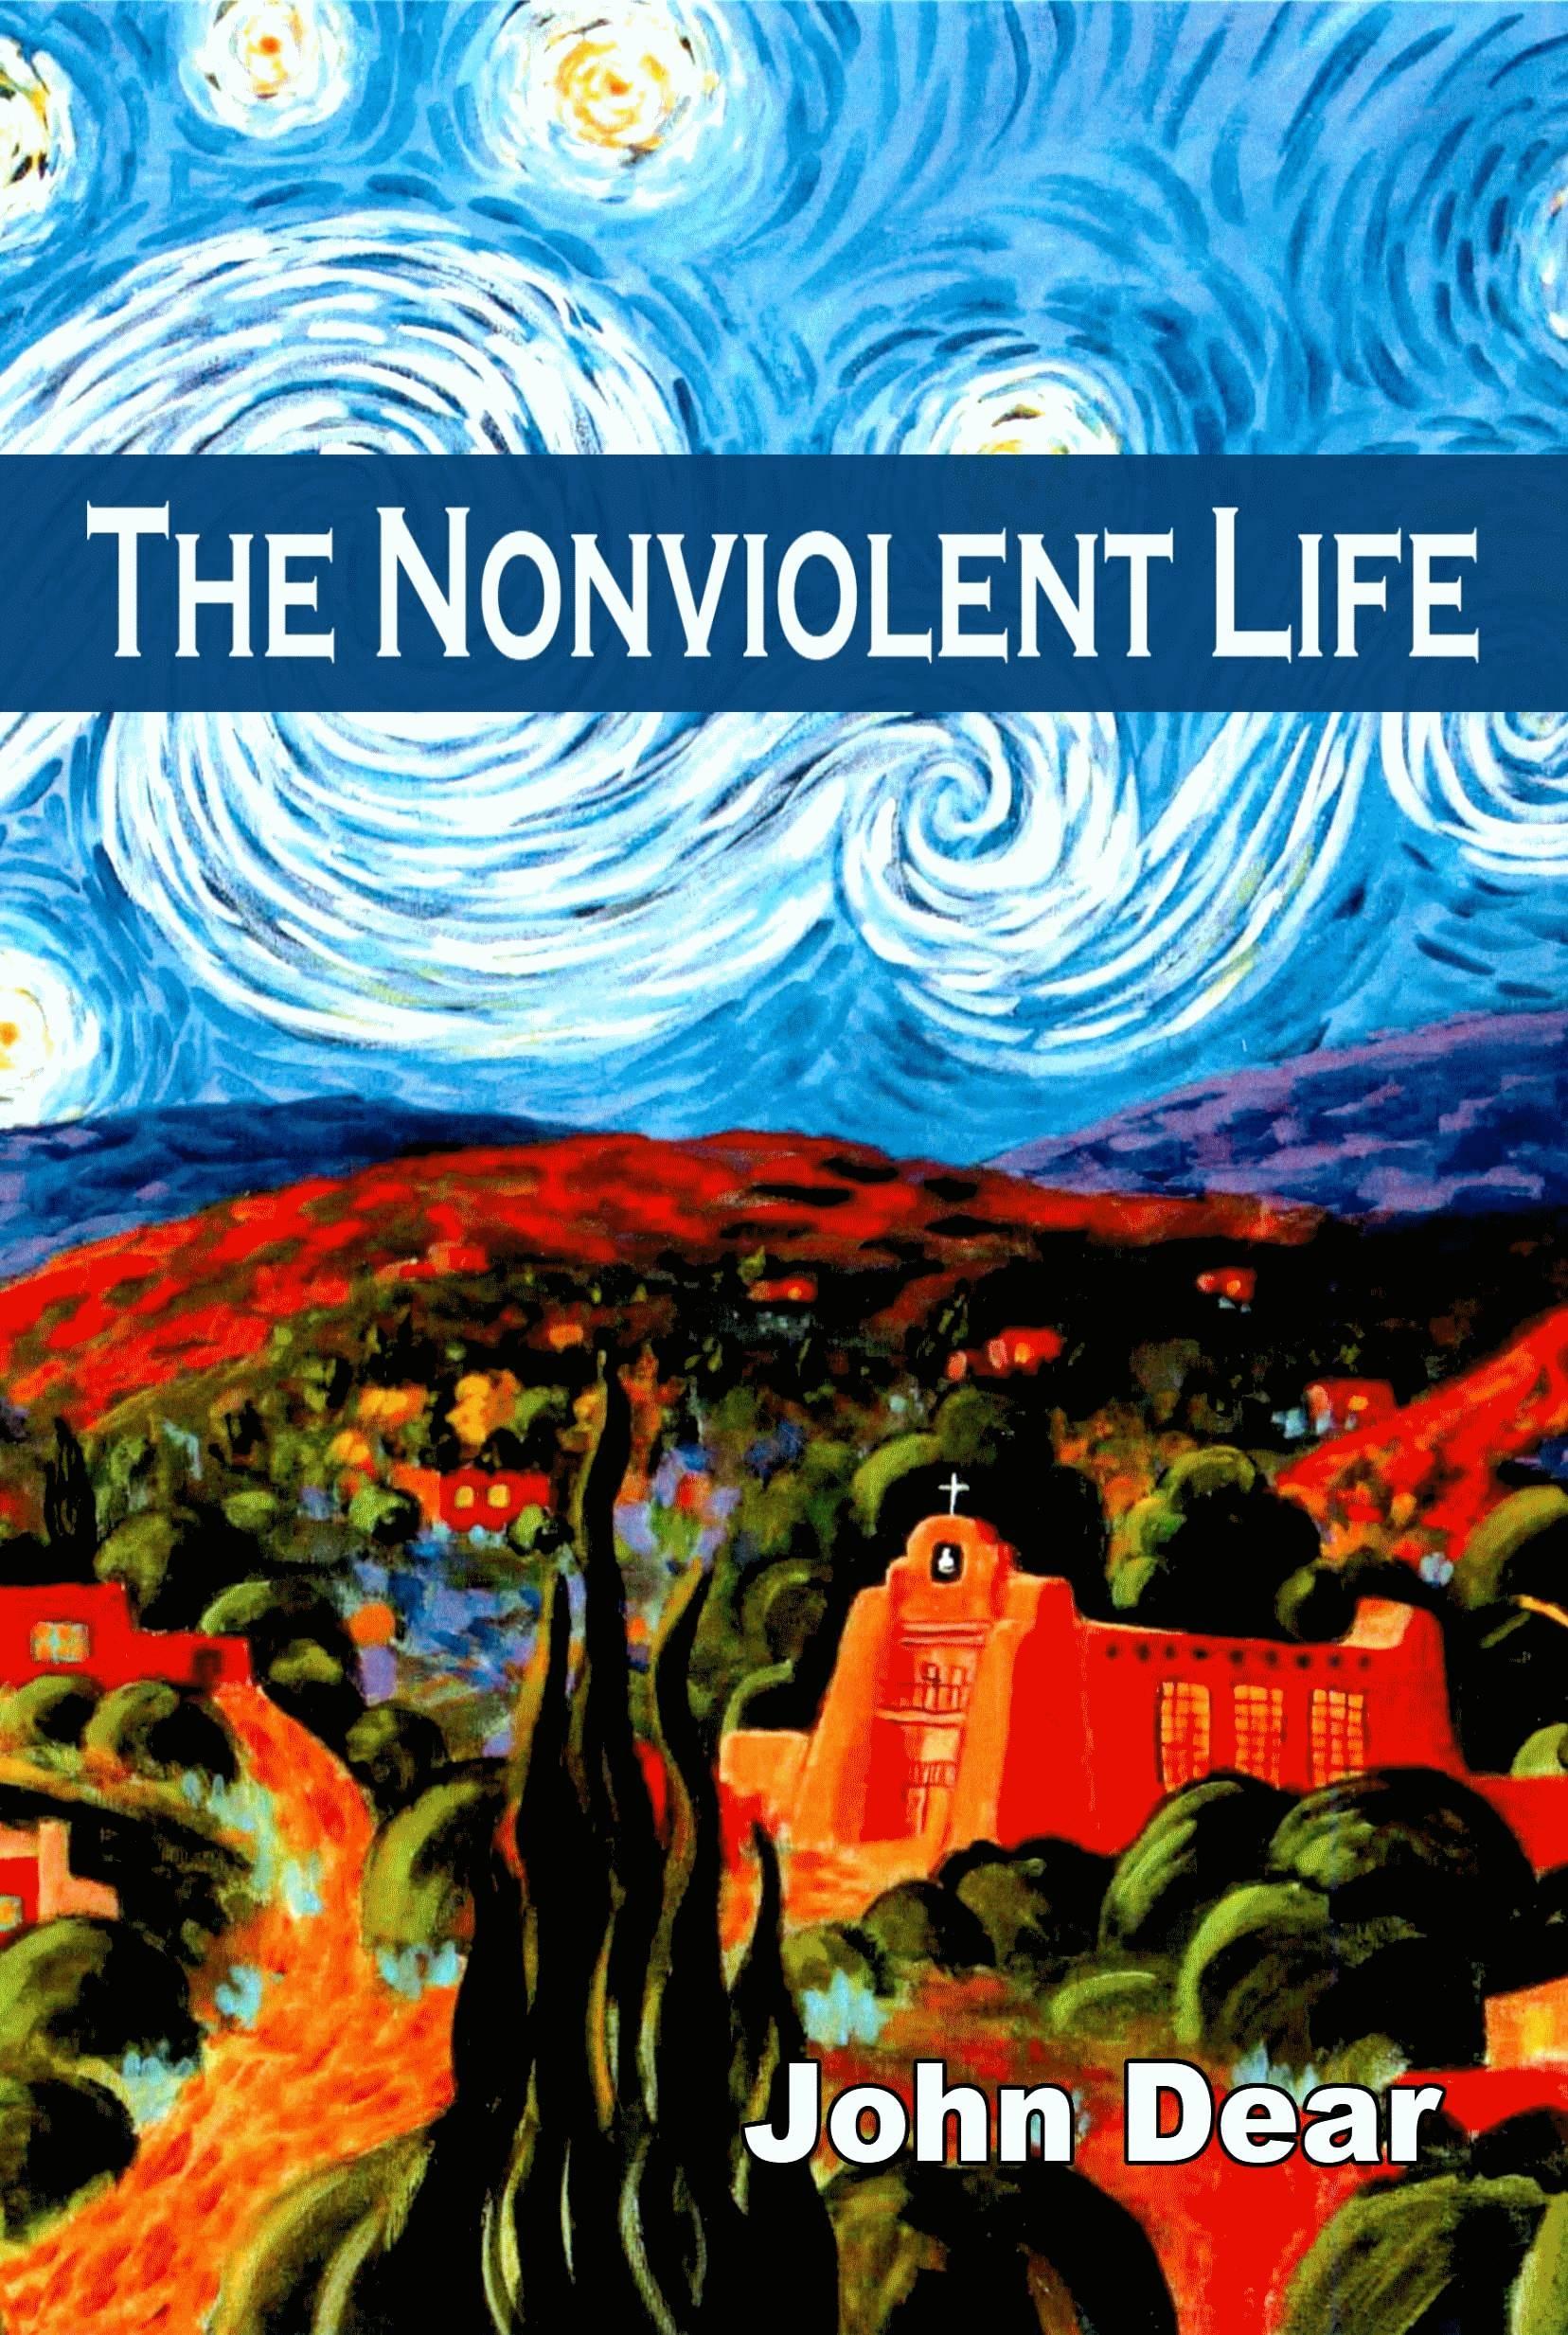 Nonviolent Life cover JPG Ver.7.1.jpg